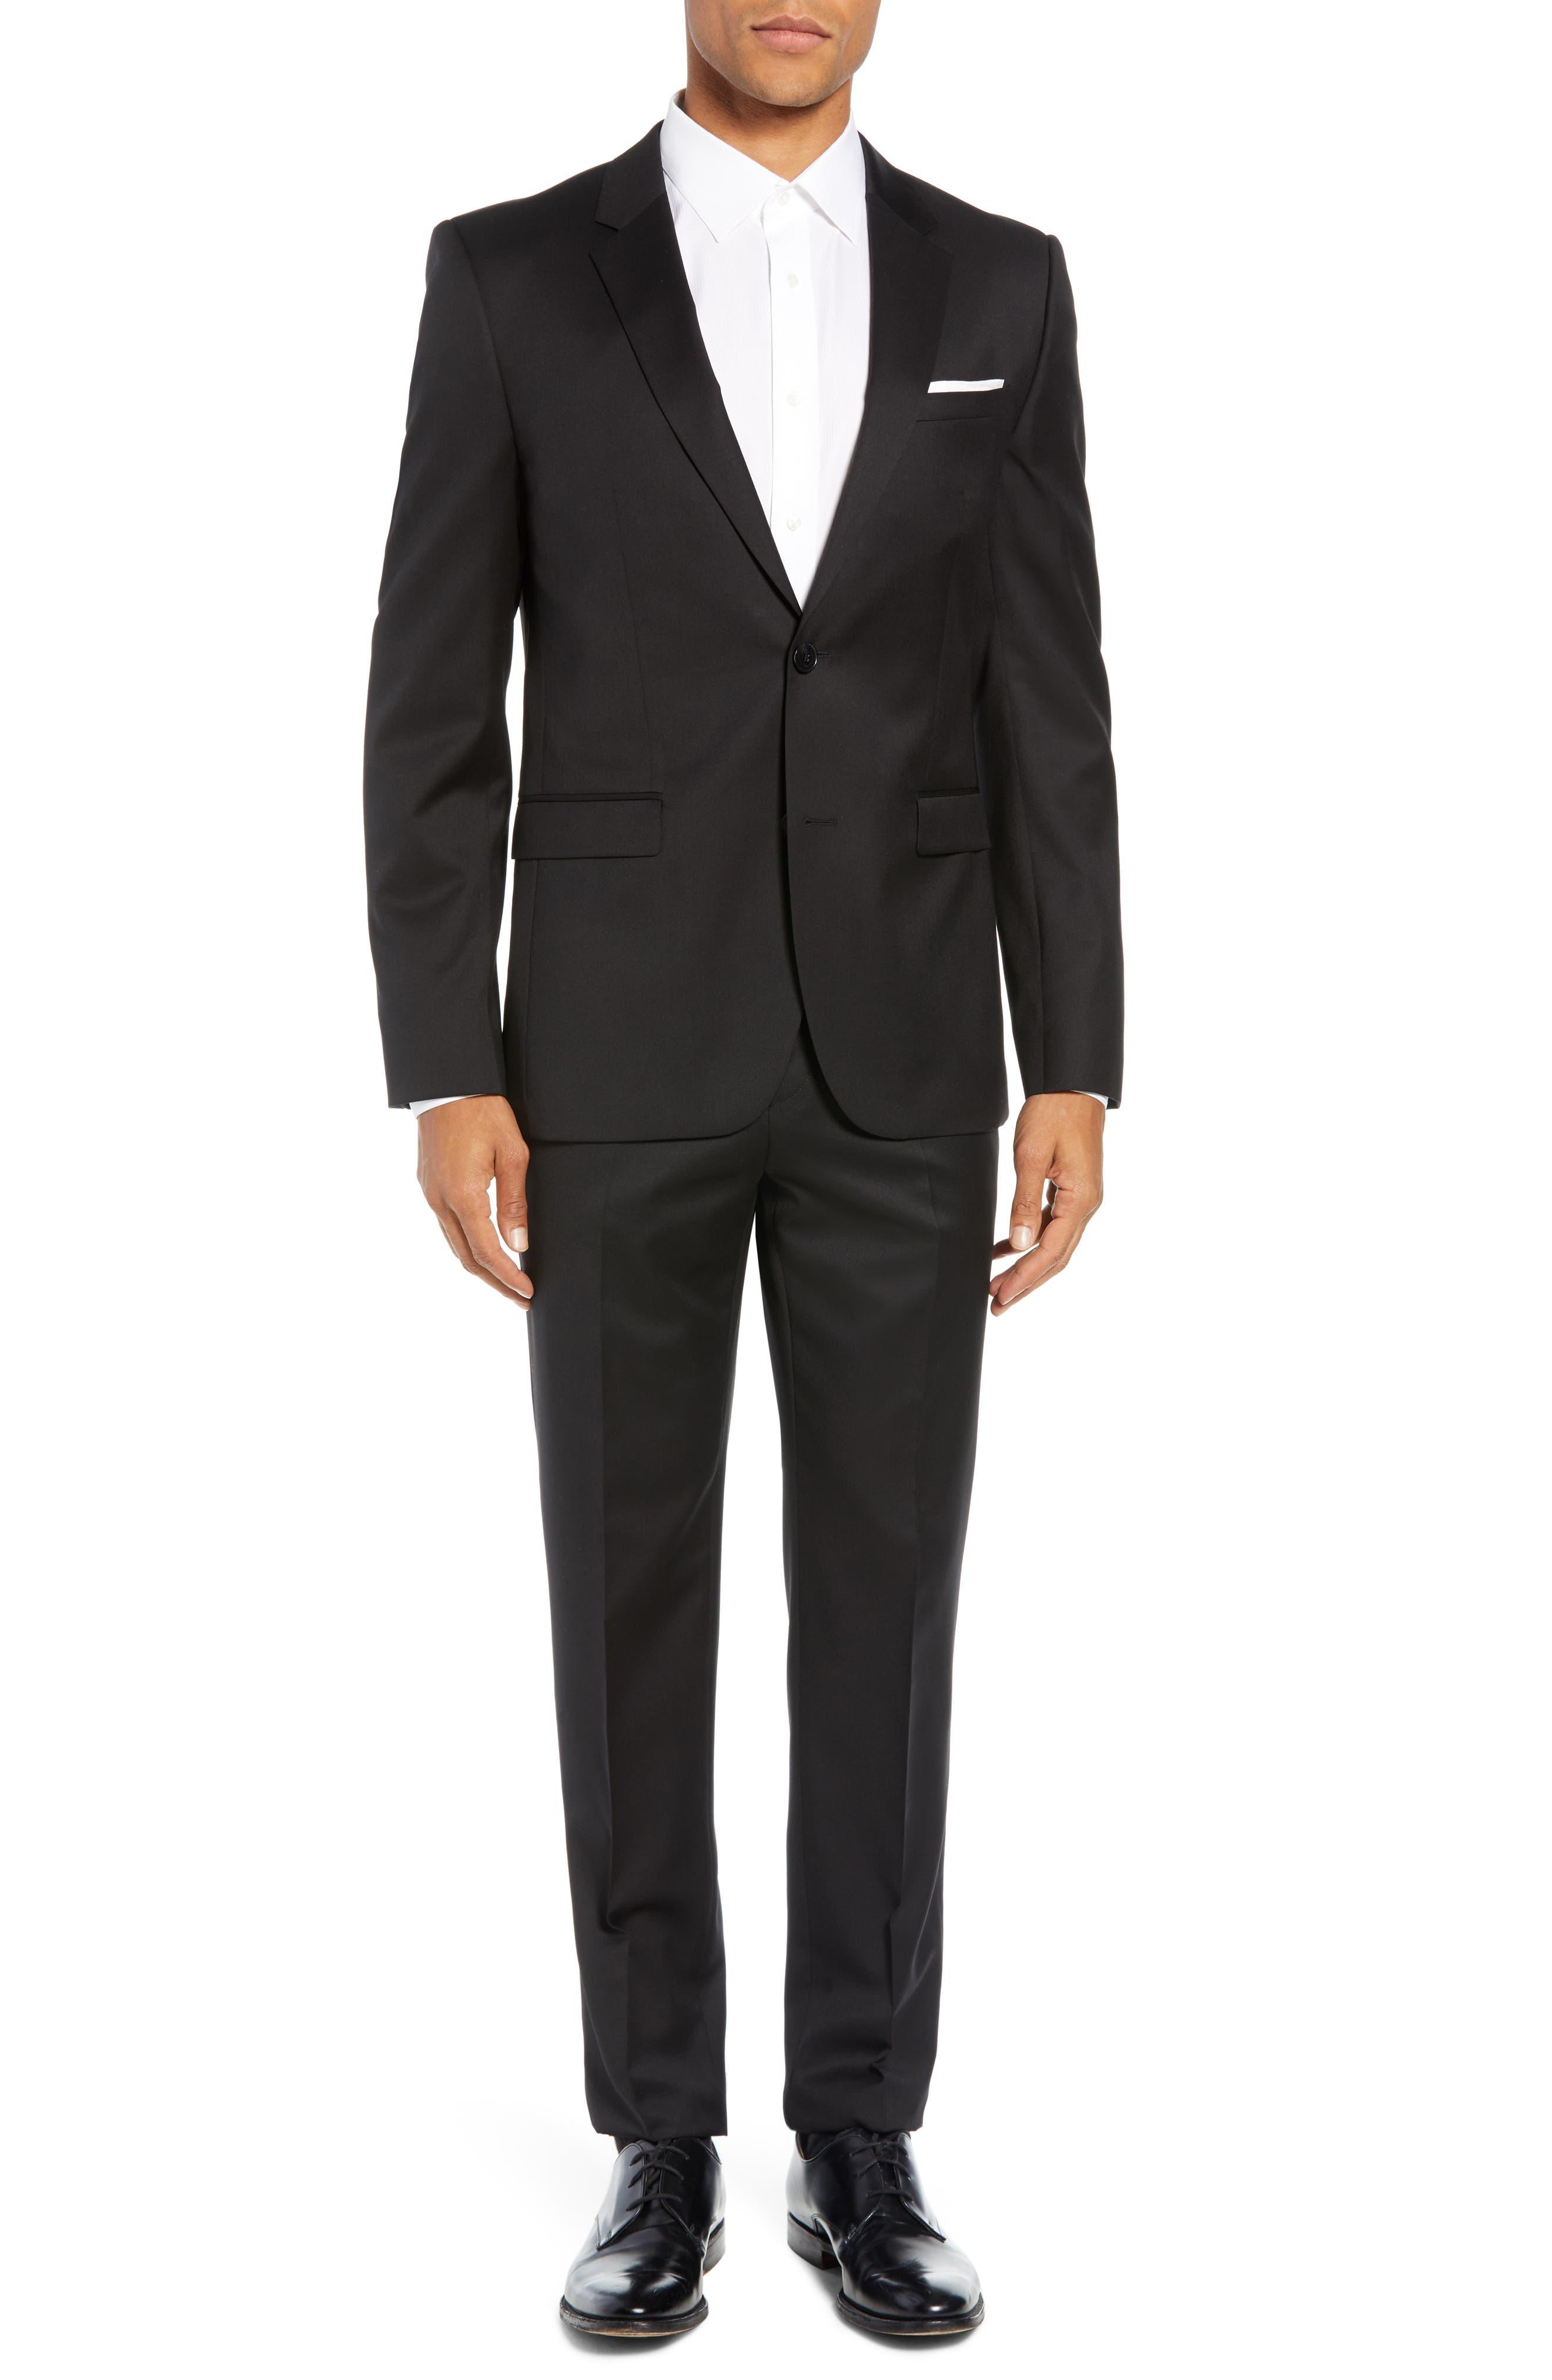 Aldon Extra Slim Fit Blazer,                             Alternate thumbnail 6, color,                             BLACK